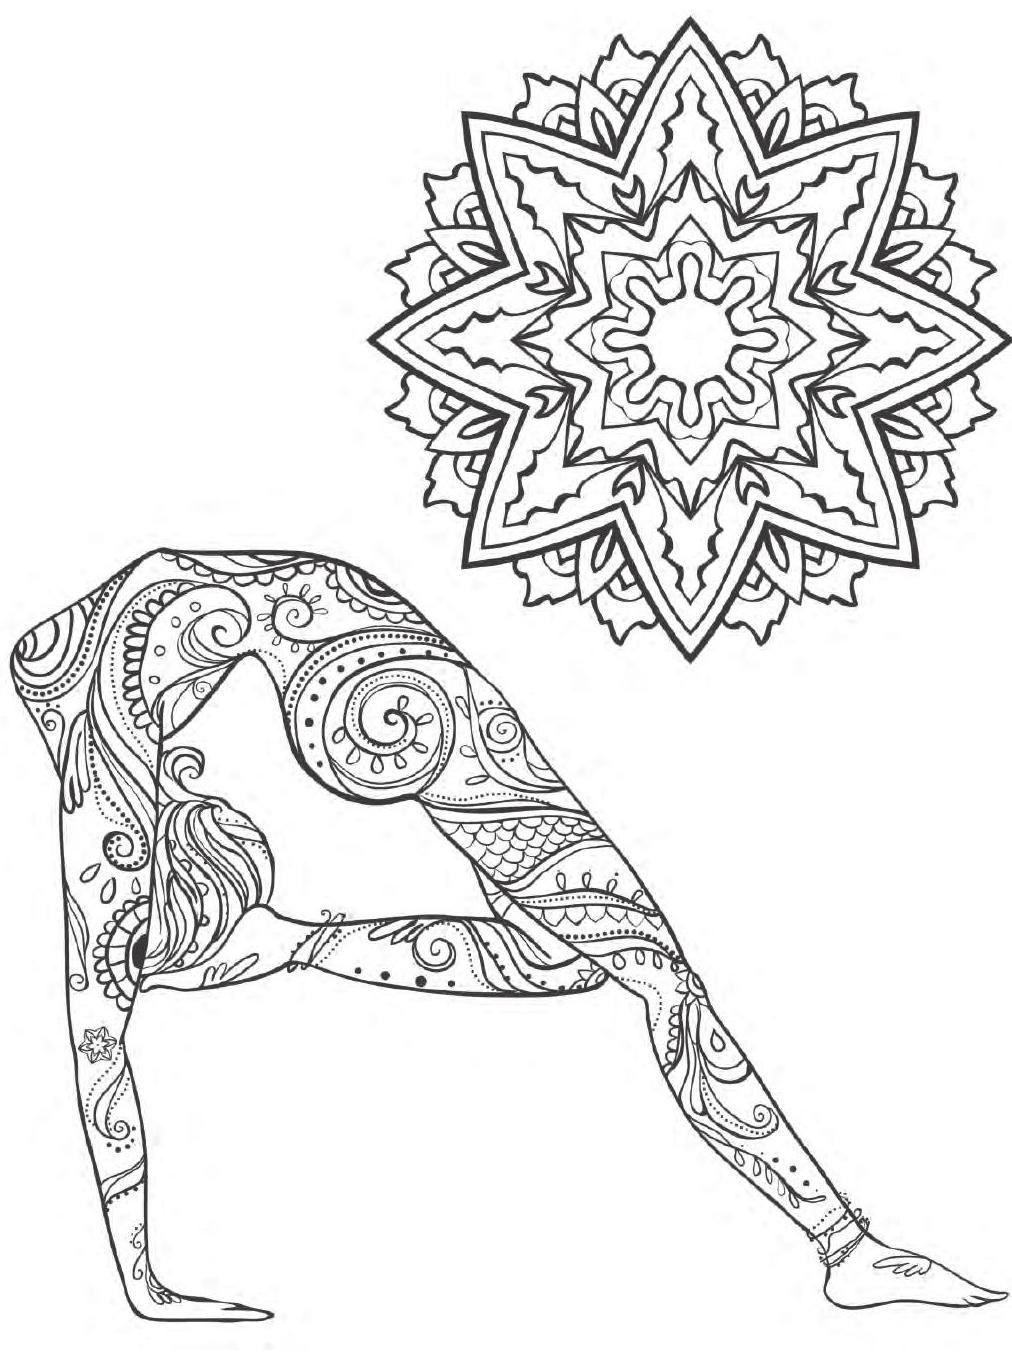 Yoga And Meditation Coloring Book For Adults With Yoga Poses And Mandalas Mandalas Para Colorir Colorir Poses De Ioga